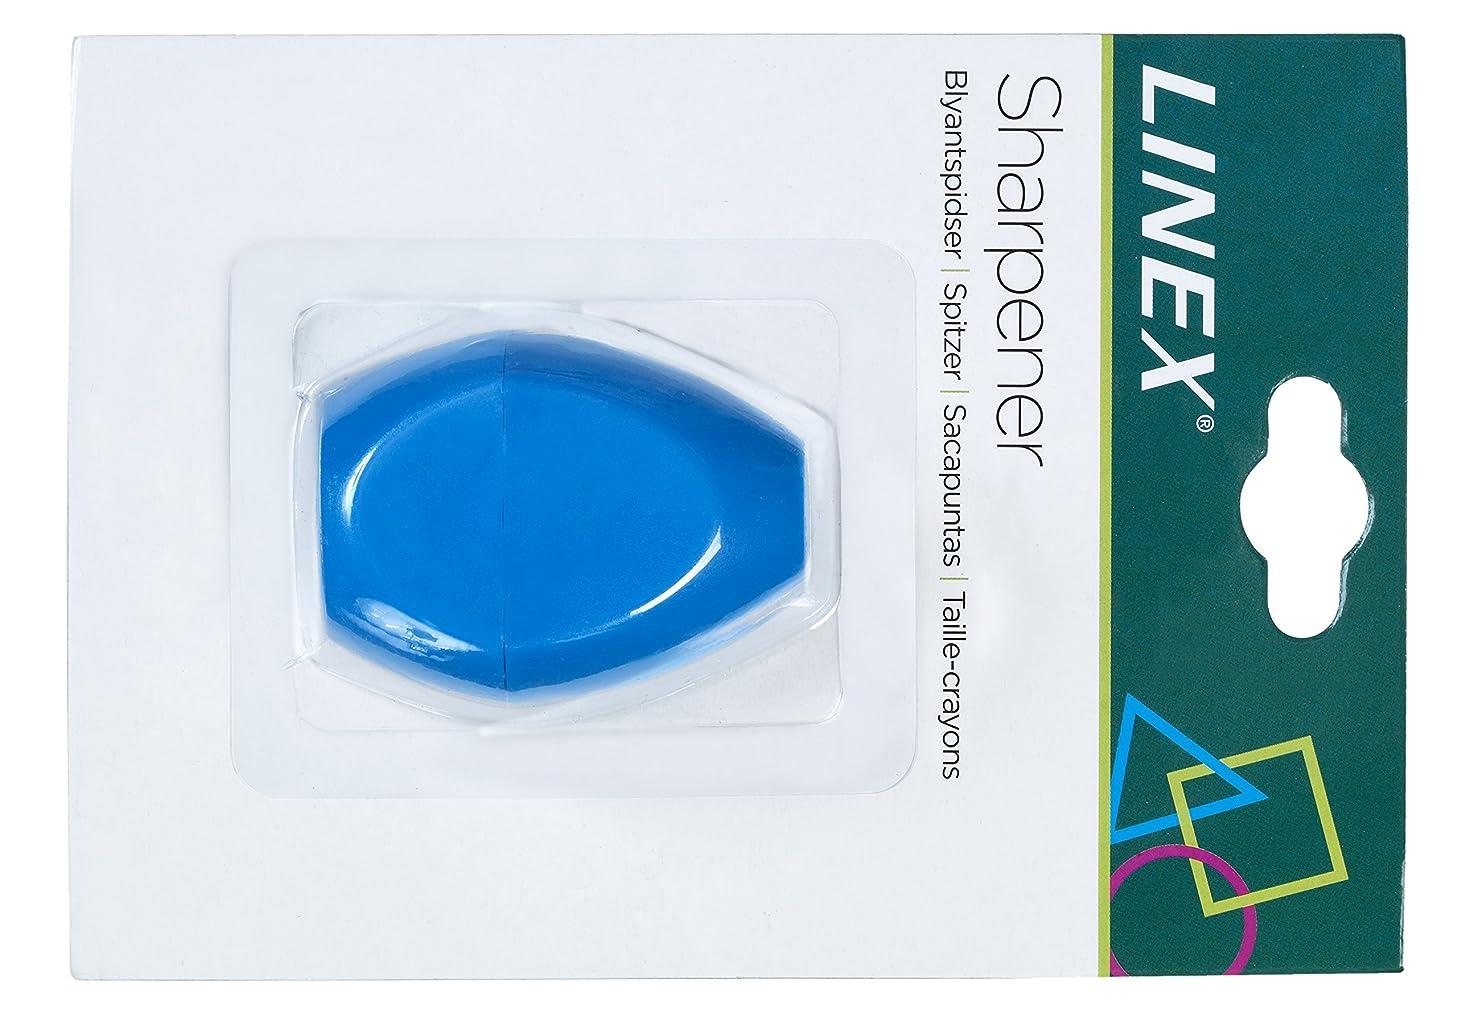 Linex Container Sharpener - Blue